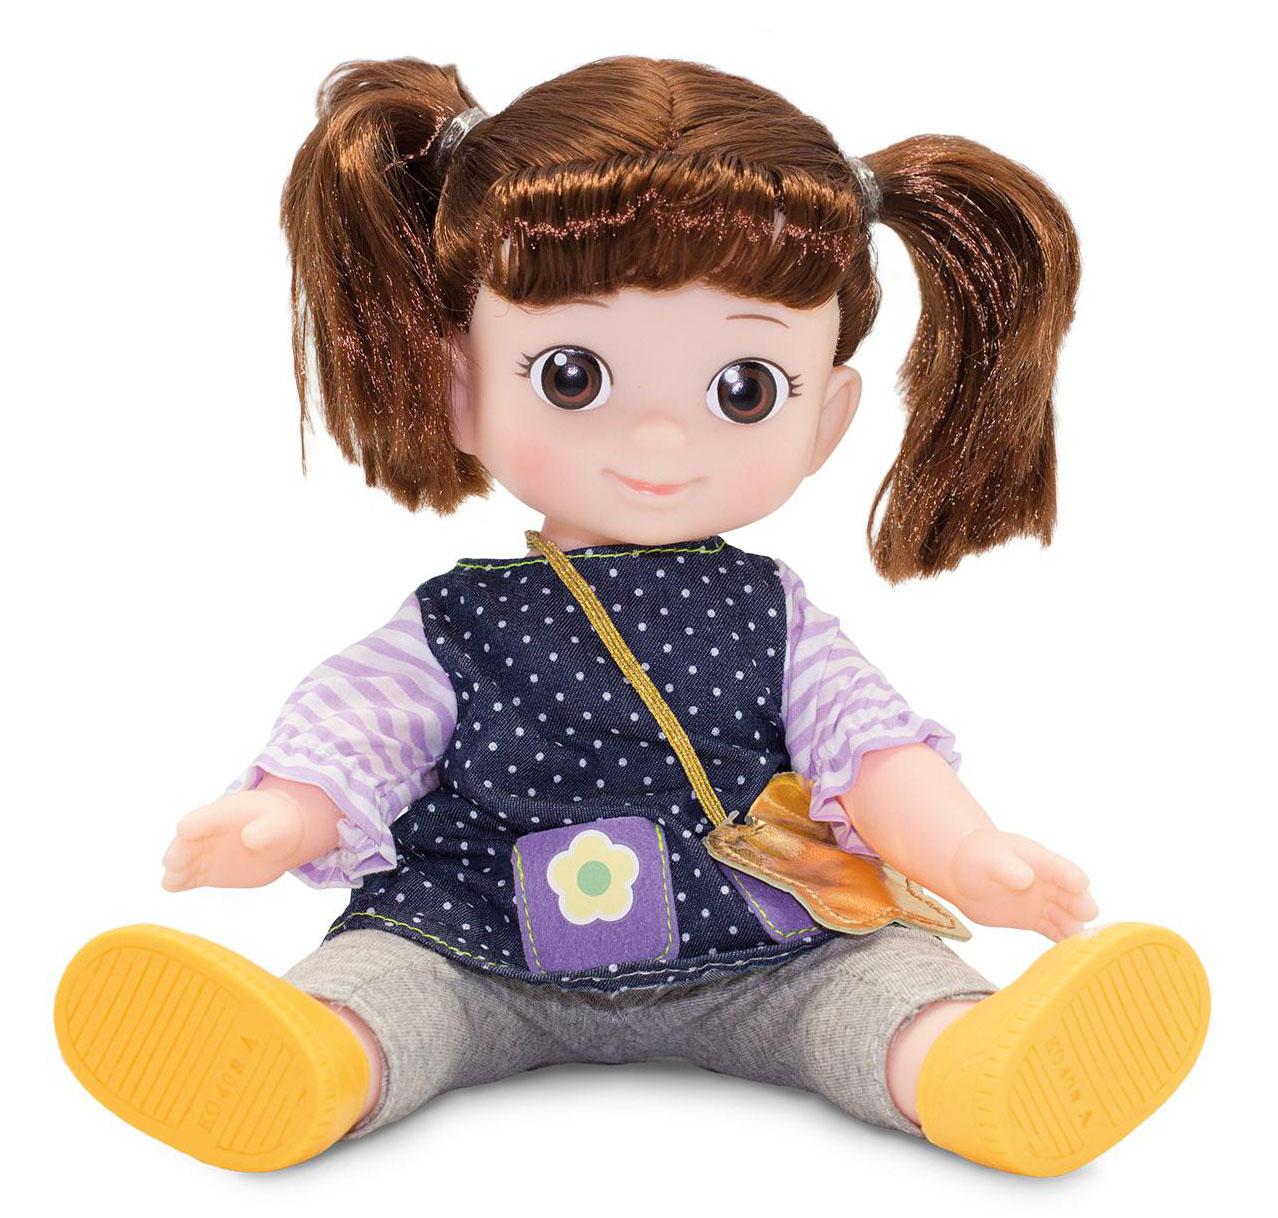 Другие куклы Консуни Консуни и совенок Сейо